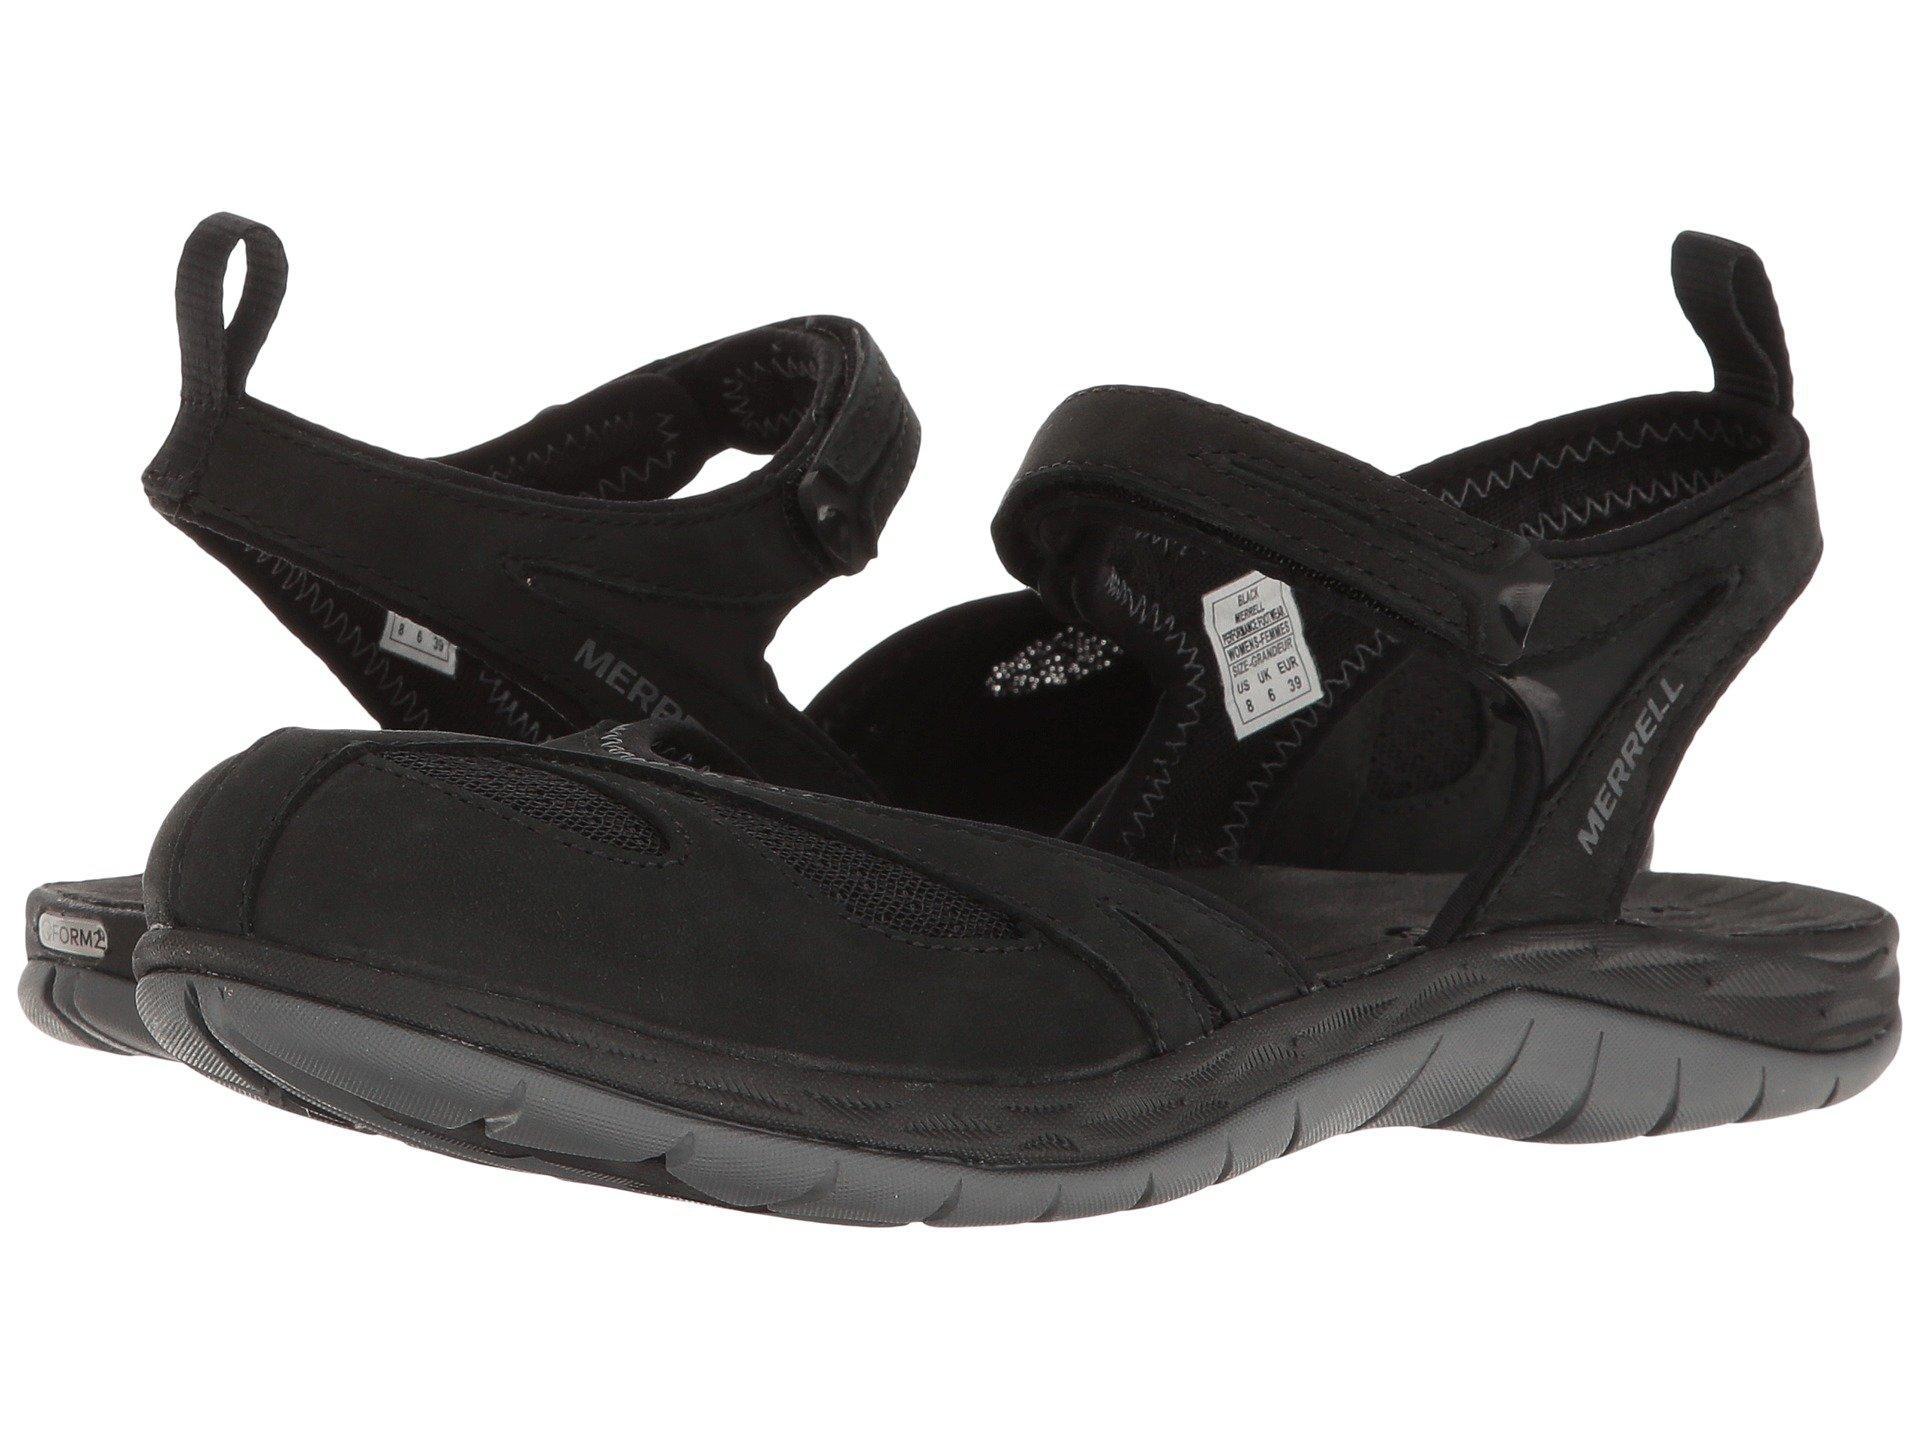 153d18f01619 Merrell - Black Women ́s Siren Wrap Q2 Sandals - Lyst. View fullscreen